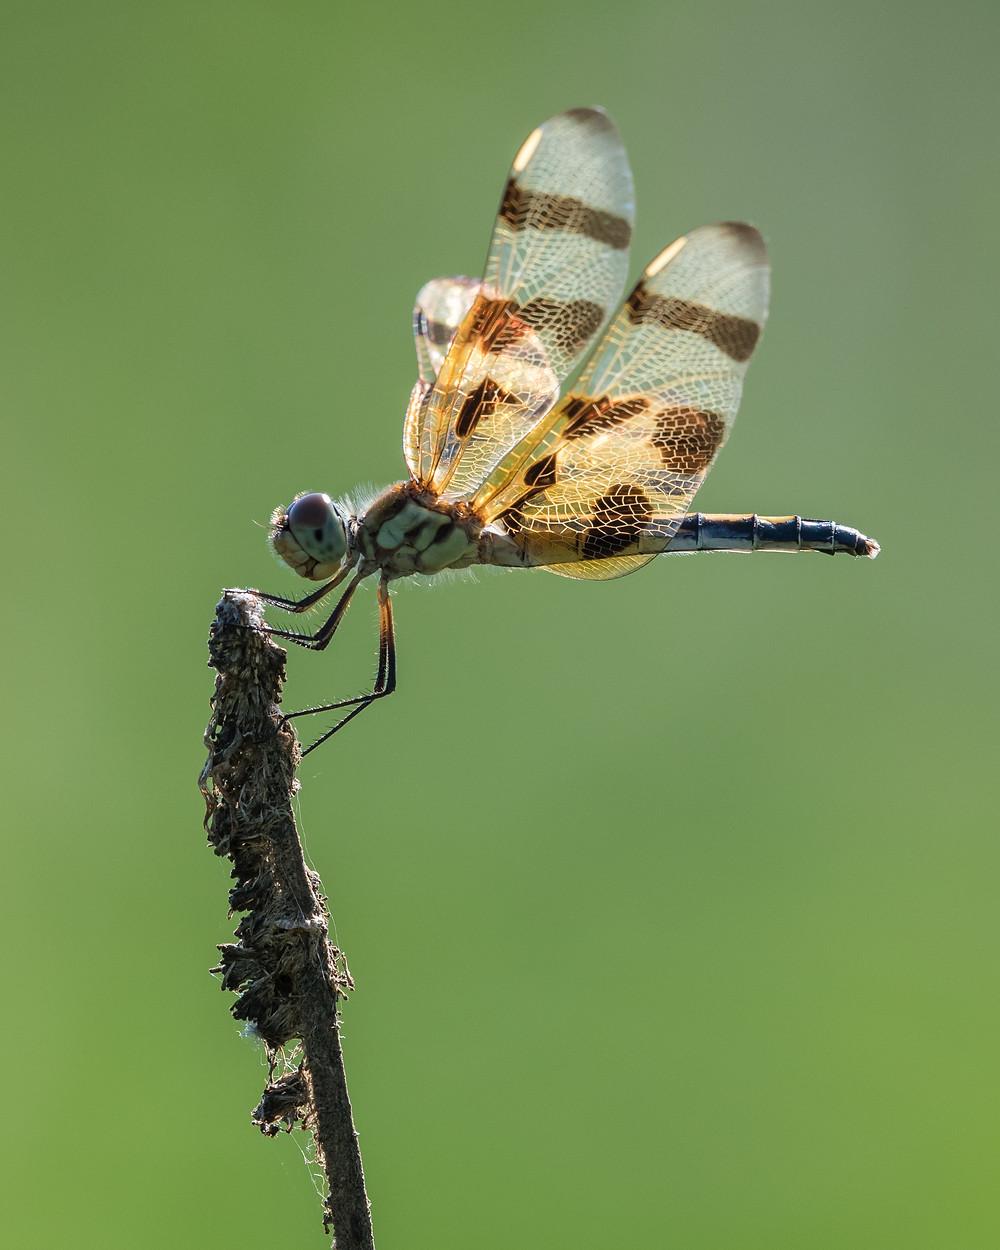 Dragonfly resting, Kenilworth Aquatic Gardens, D.C.